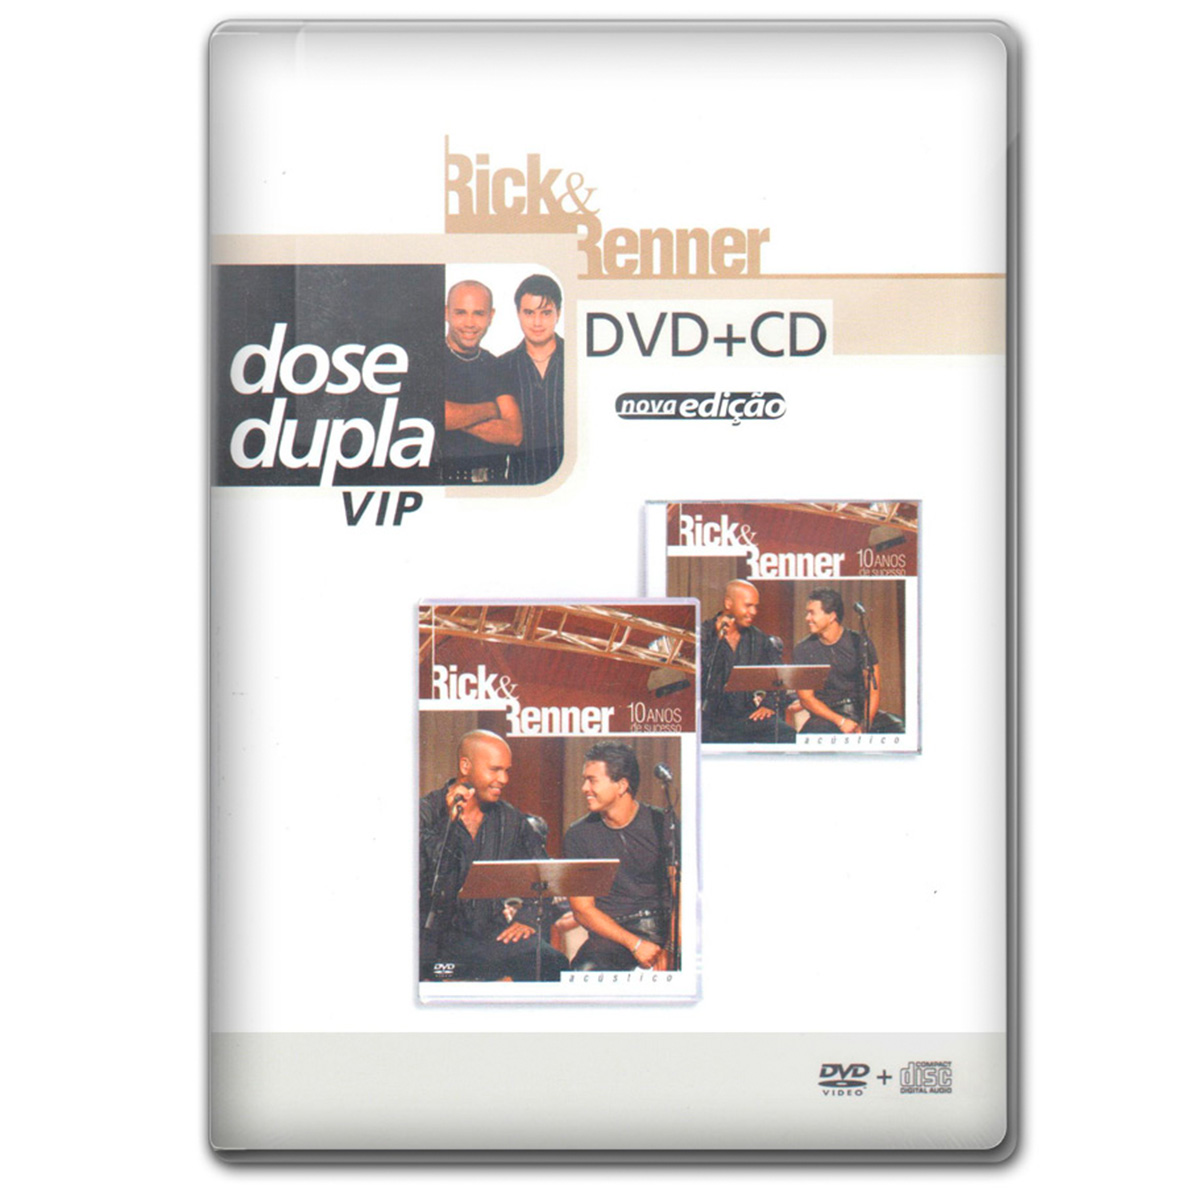 CD + DVD Rick & Renner 10 Anos de Sucesso